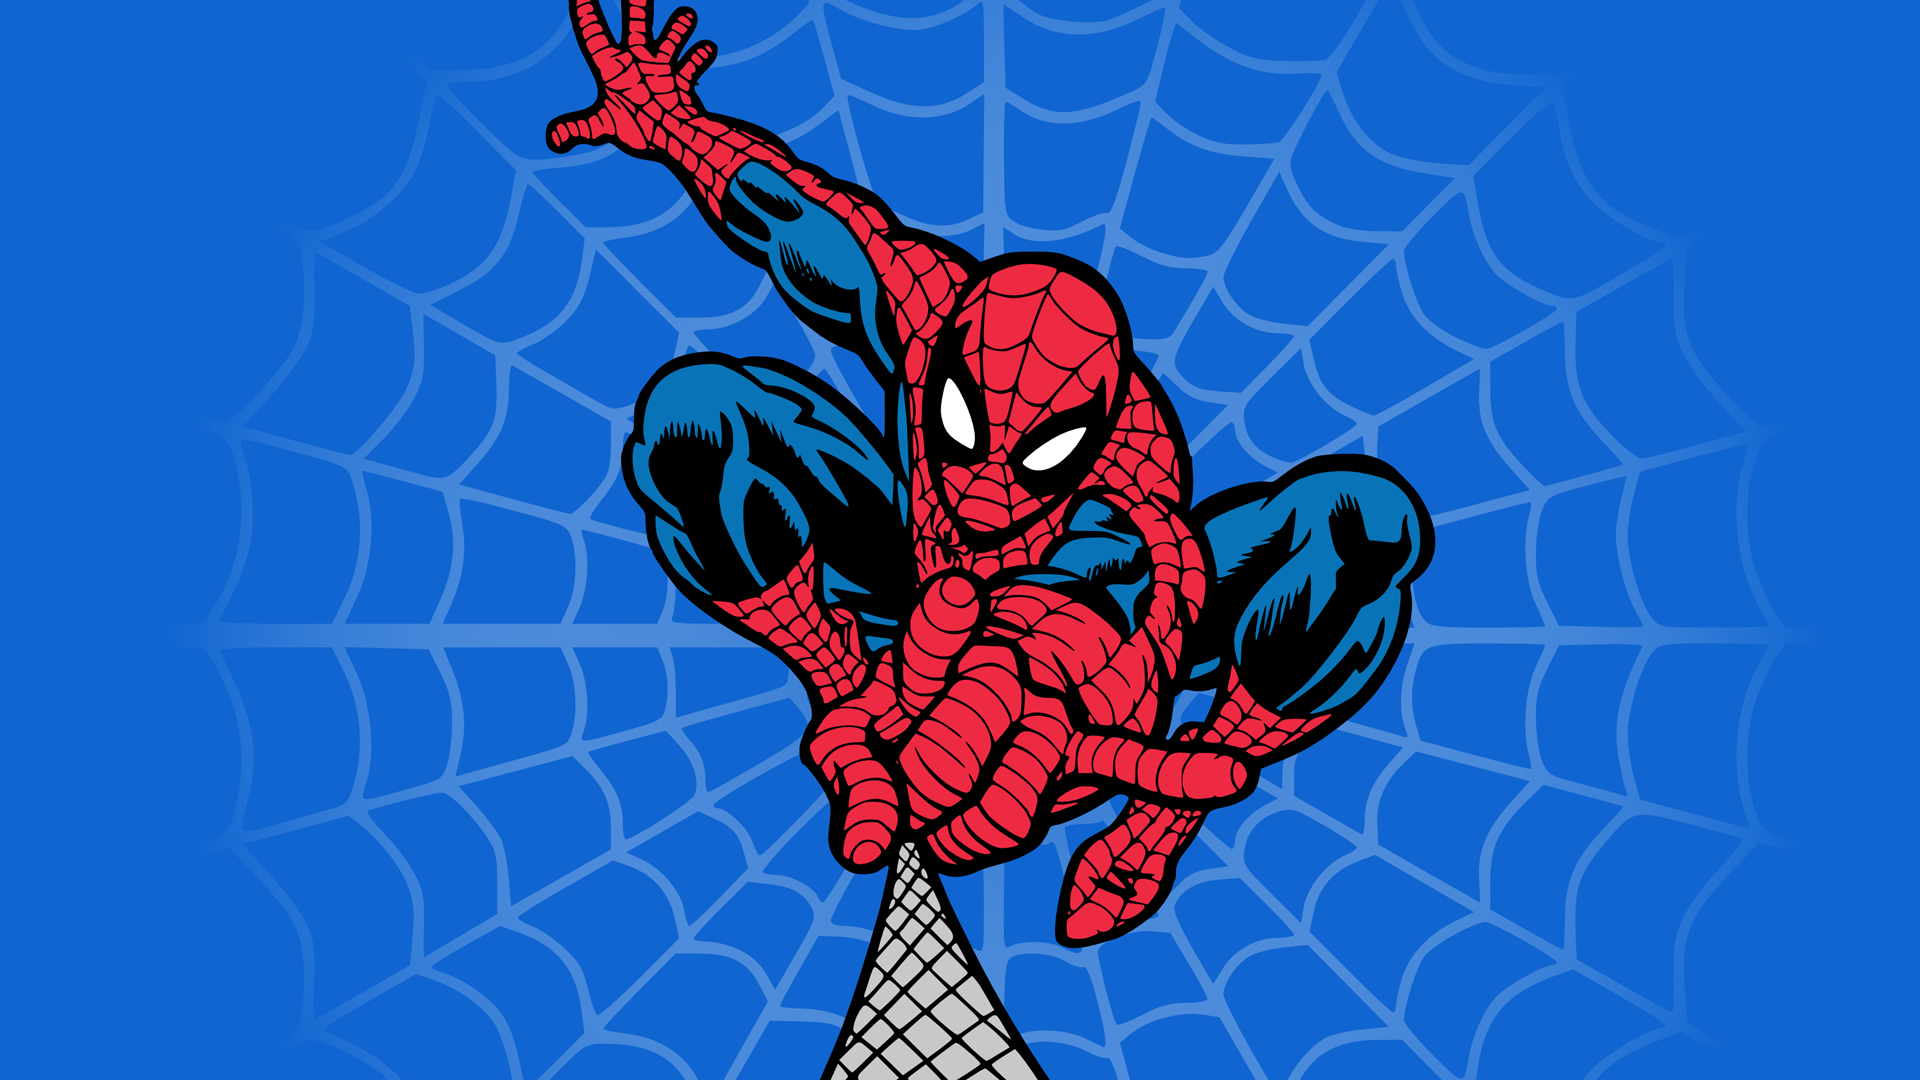 Dibujo spiderman wallpaper rincon util - Images de spiderman ...